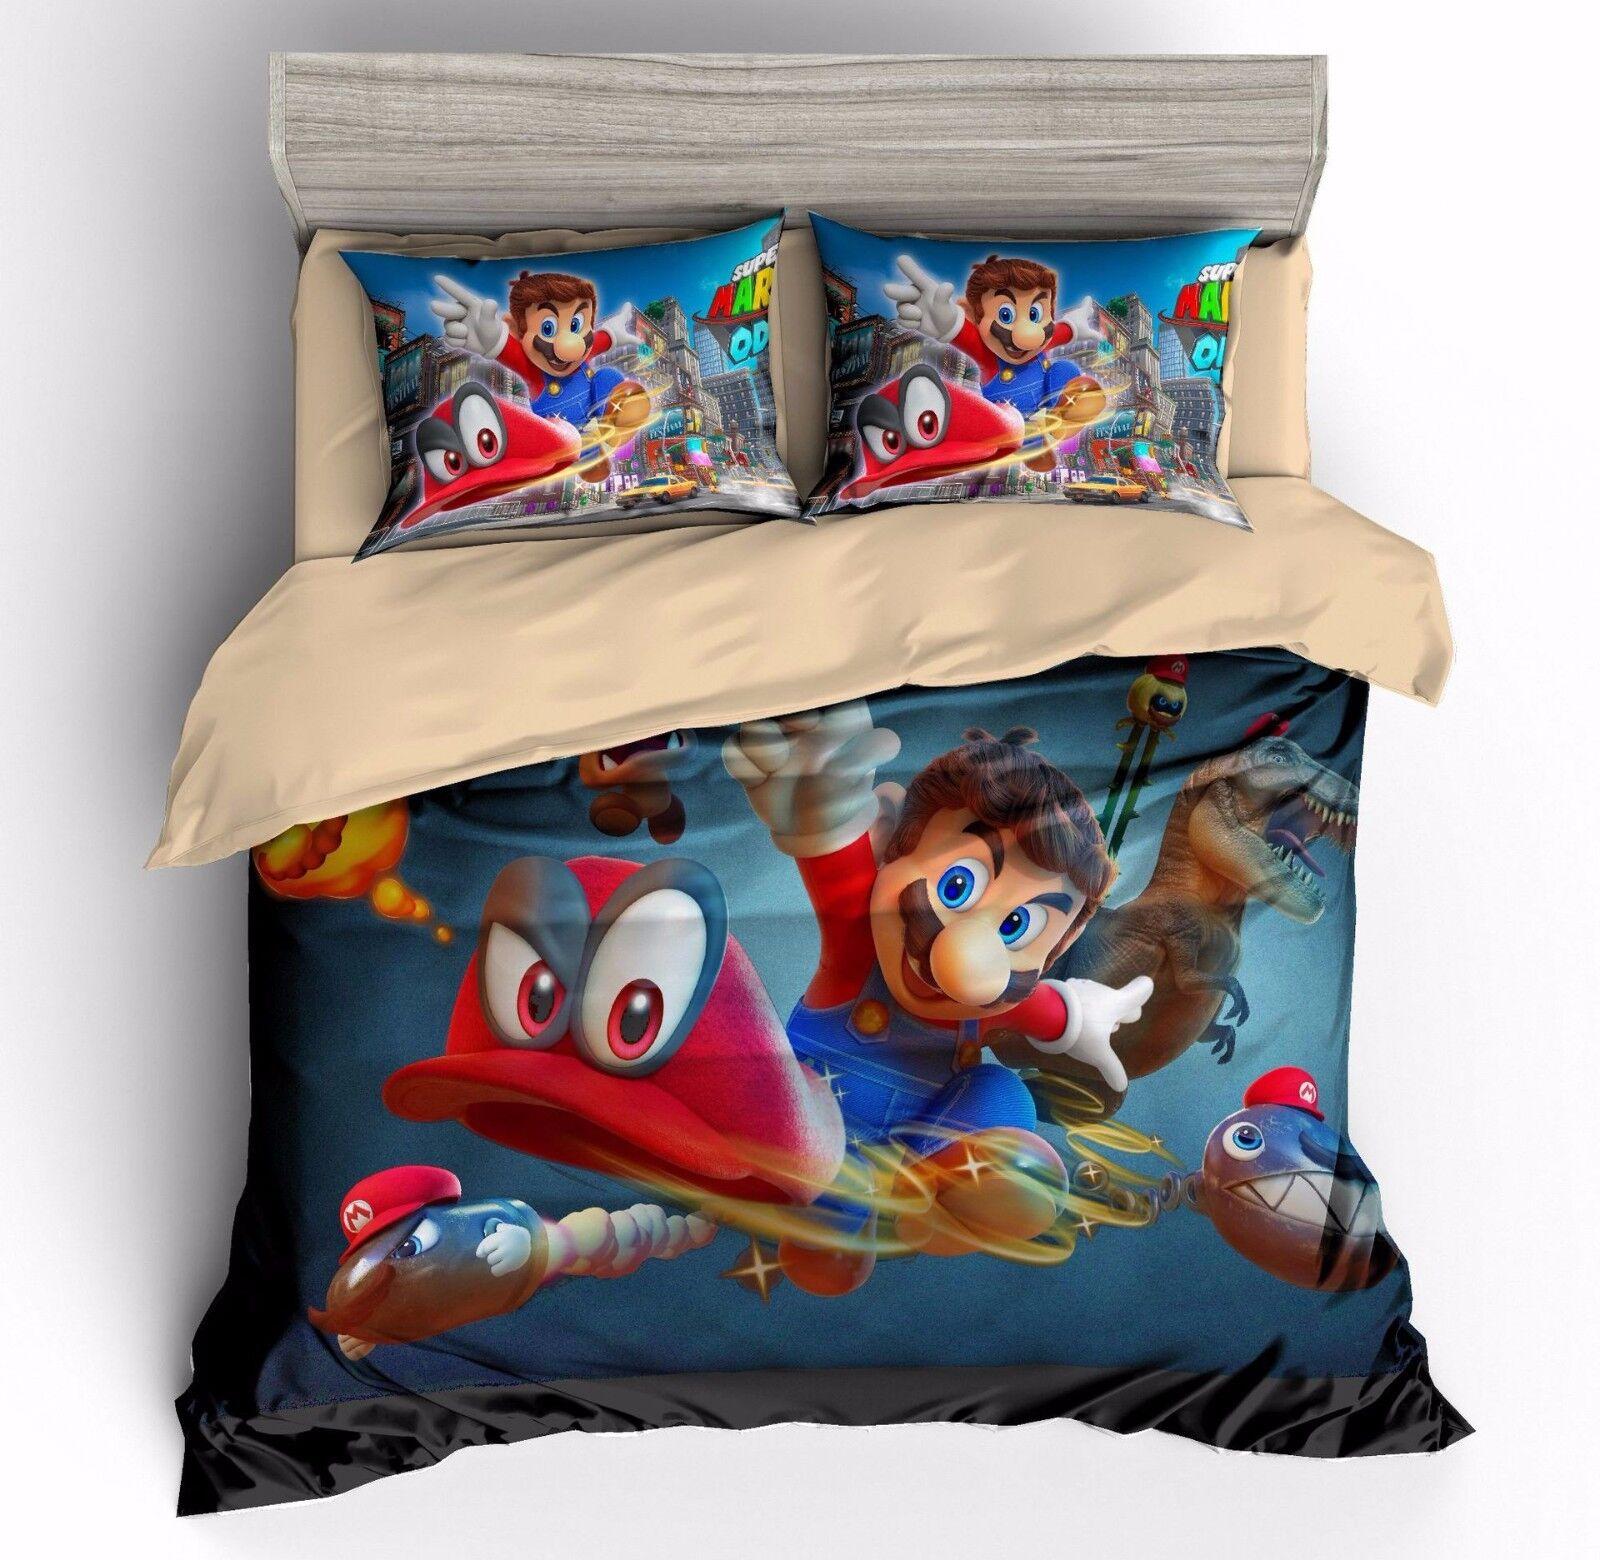 Super Mario Odyssey Kids Bedding Set Duvet Cover Sets Zip Quilt Cover Pillowcase